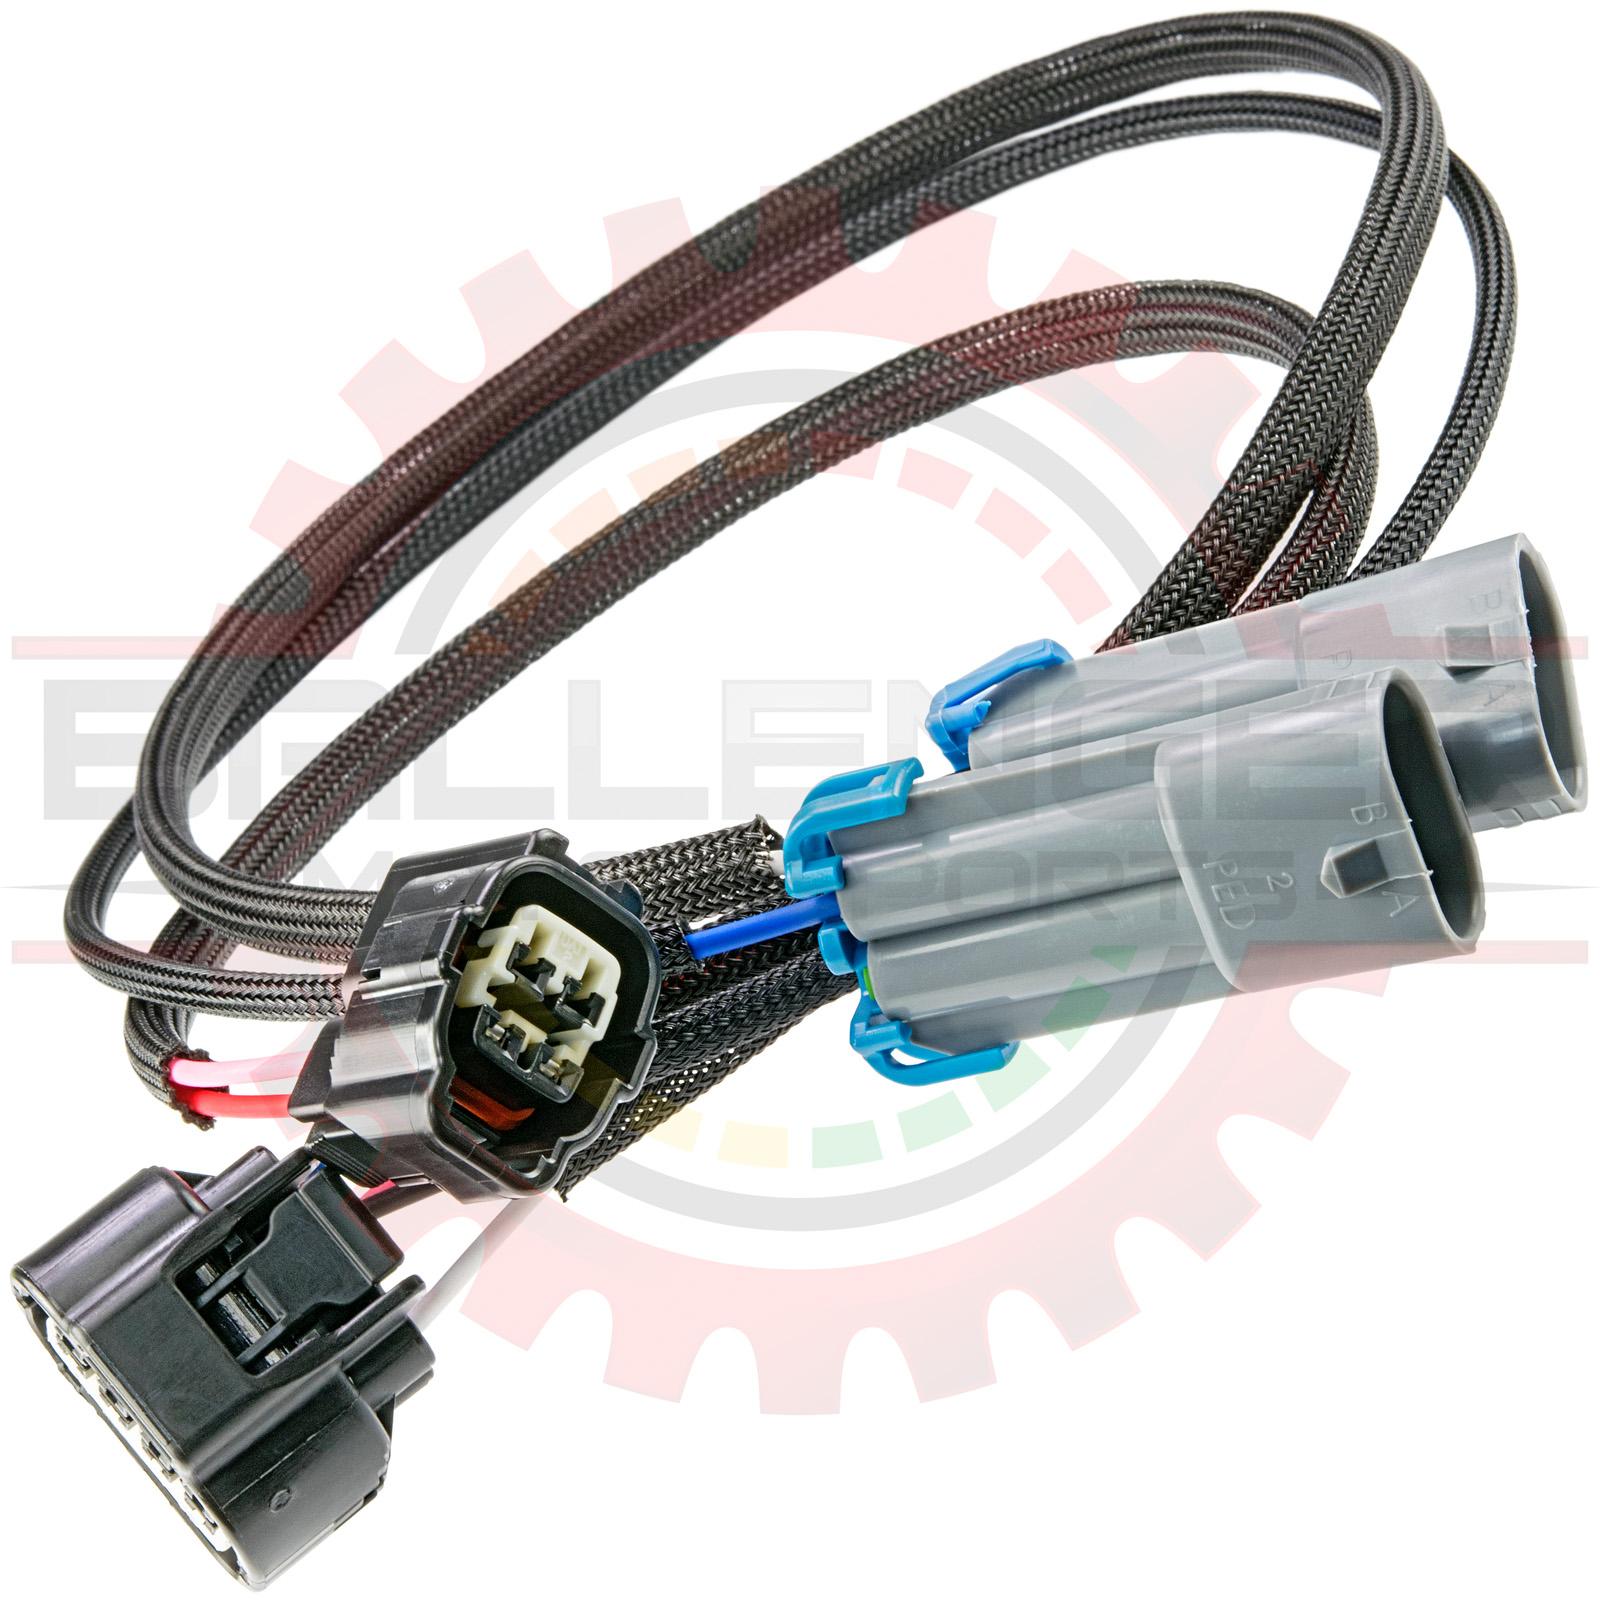 Home Shop Connectors Harnesses Yazaki Tundra Led Retrofit 2014 Headlight Wiring Diagram Auto Harness